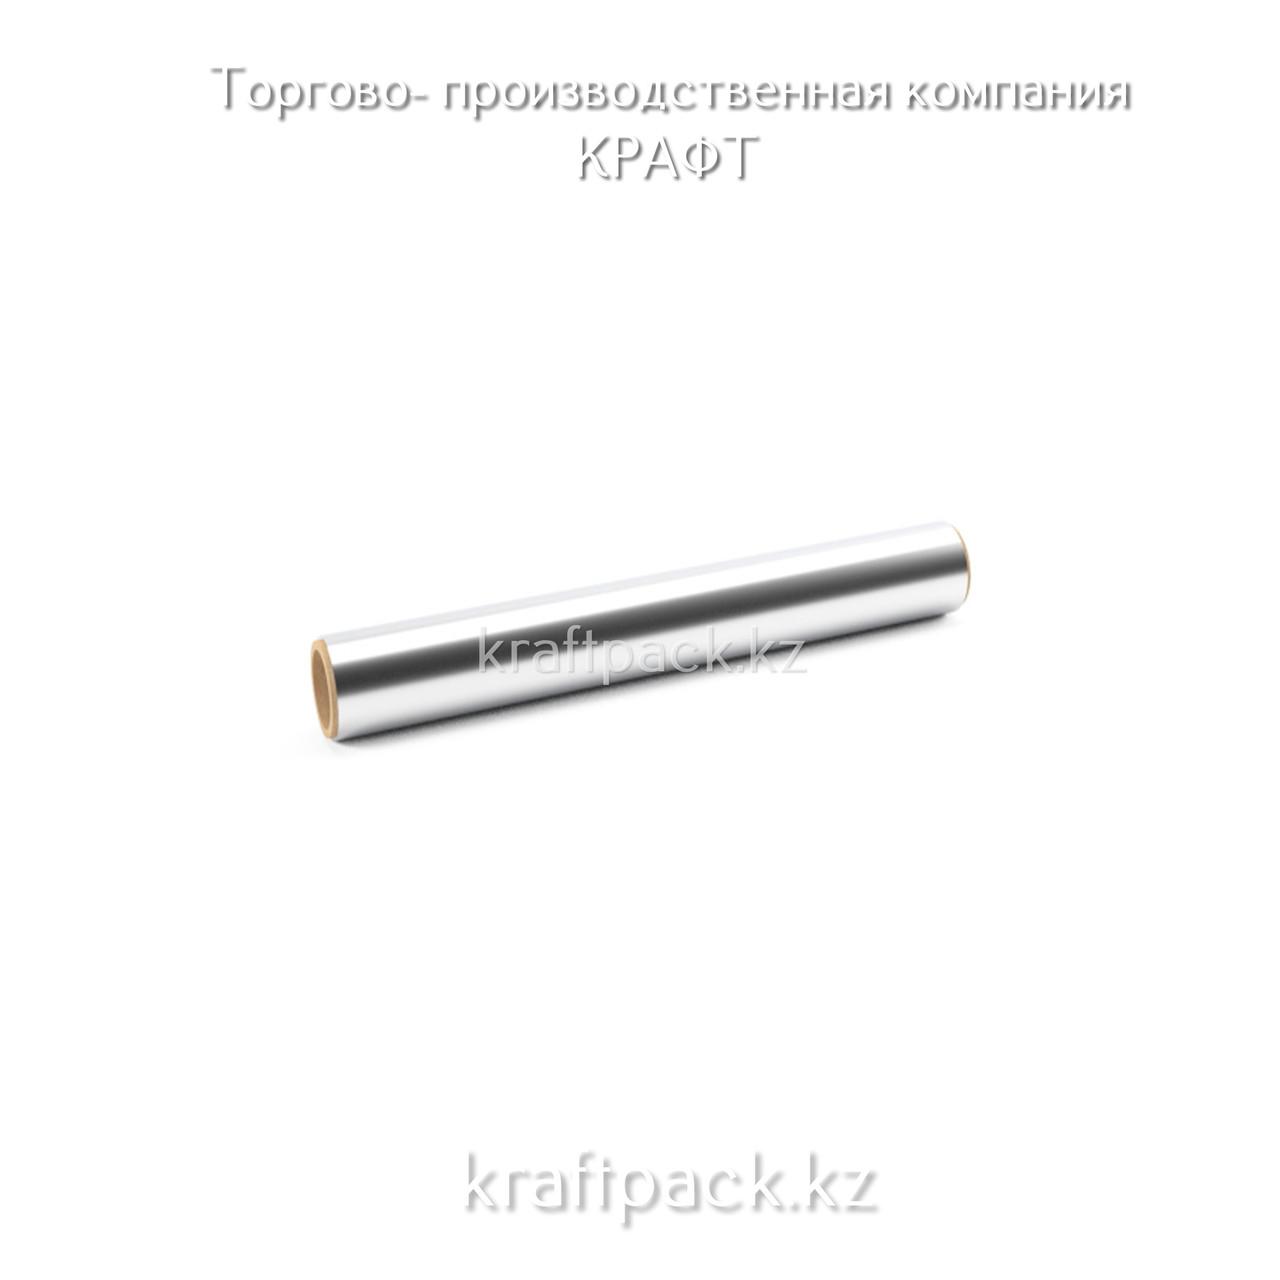 Фольга алюм. 290мм х 100м, EXTRA особопрочная 16 мкр (РОС) (12шт/кор)